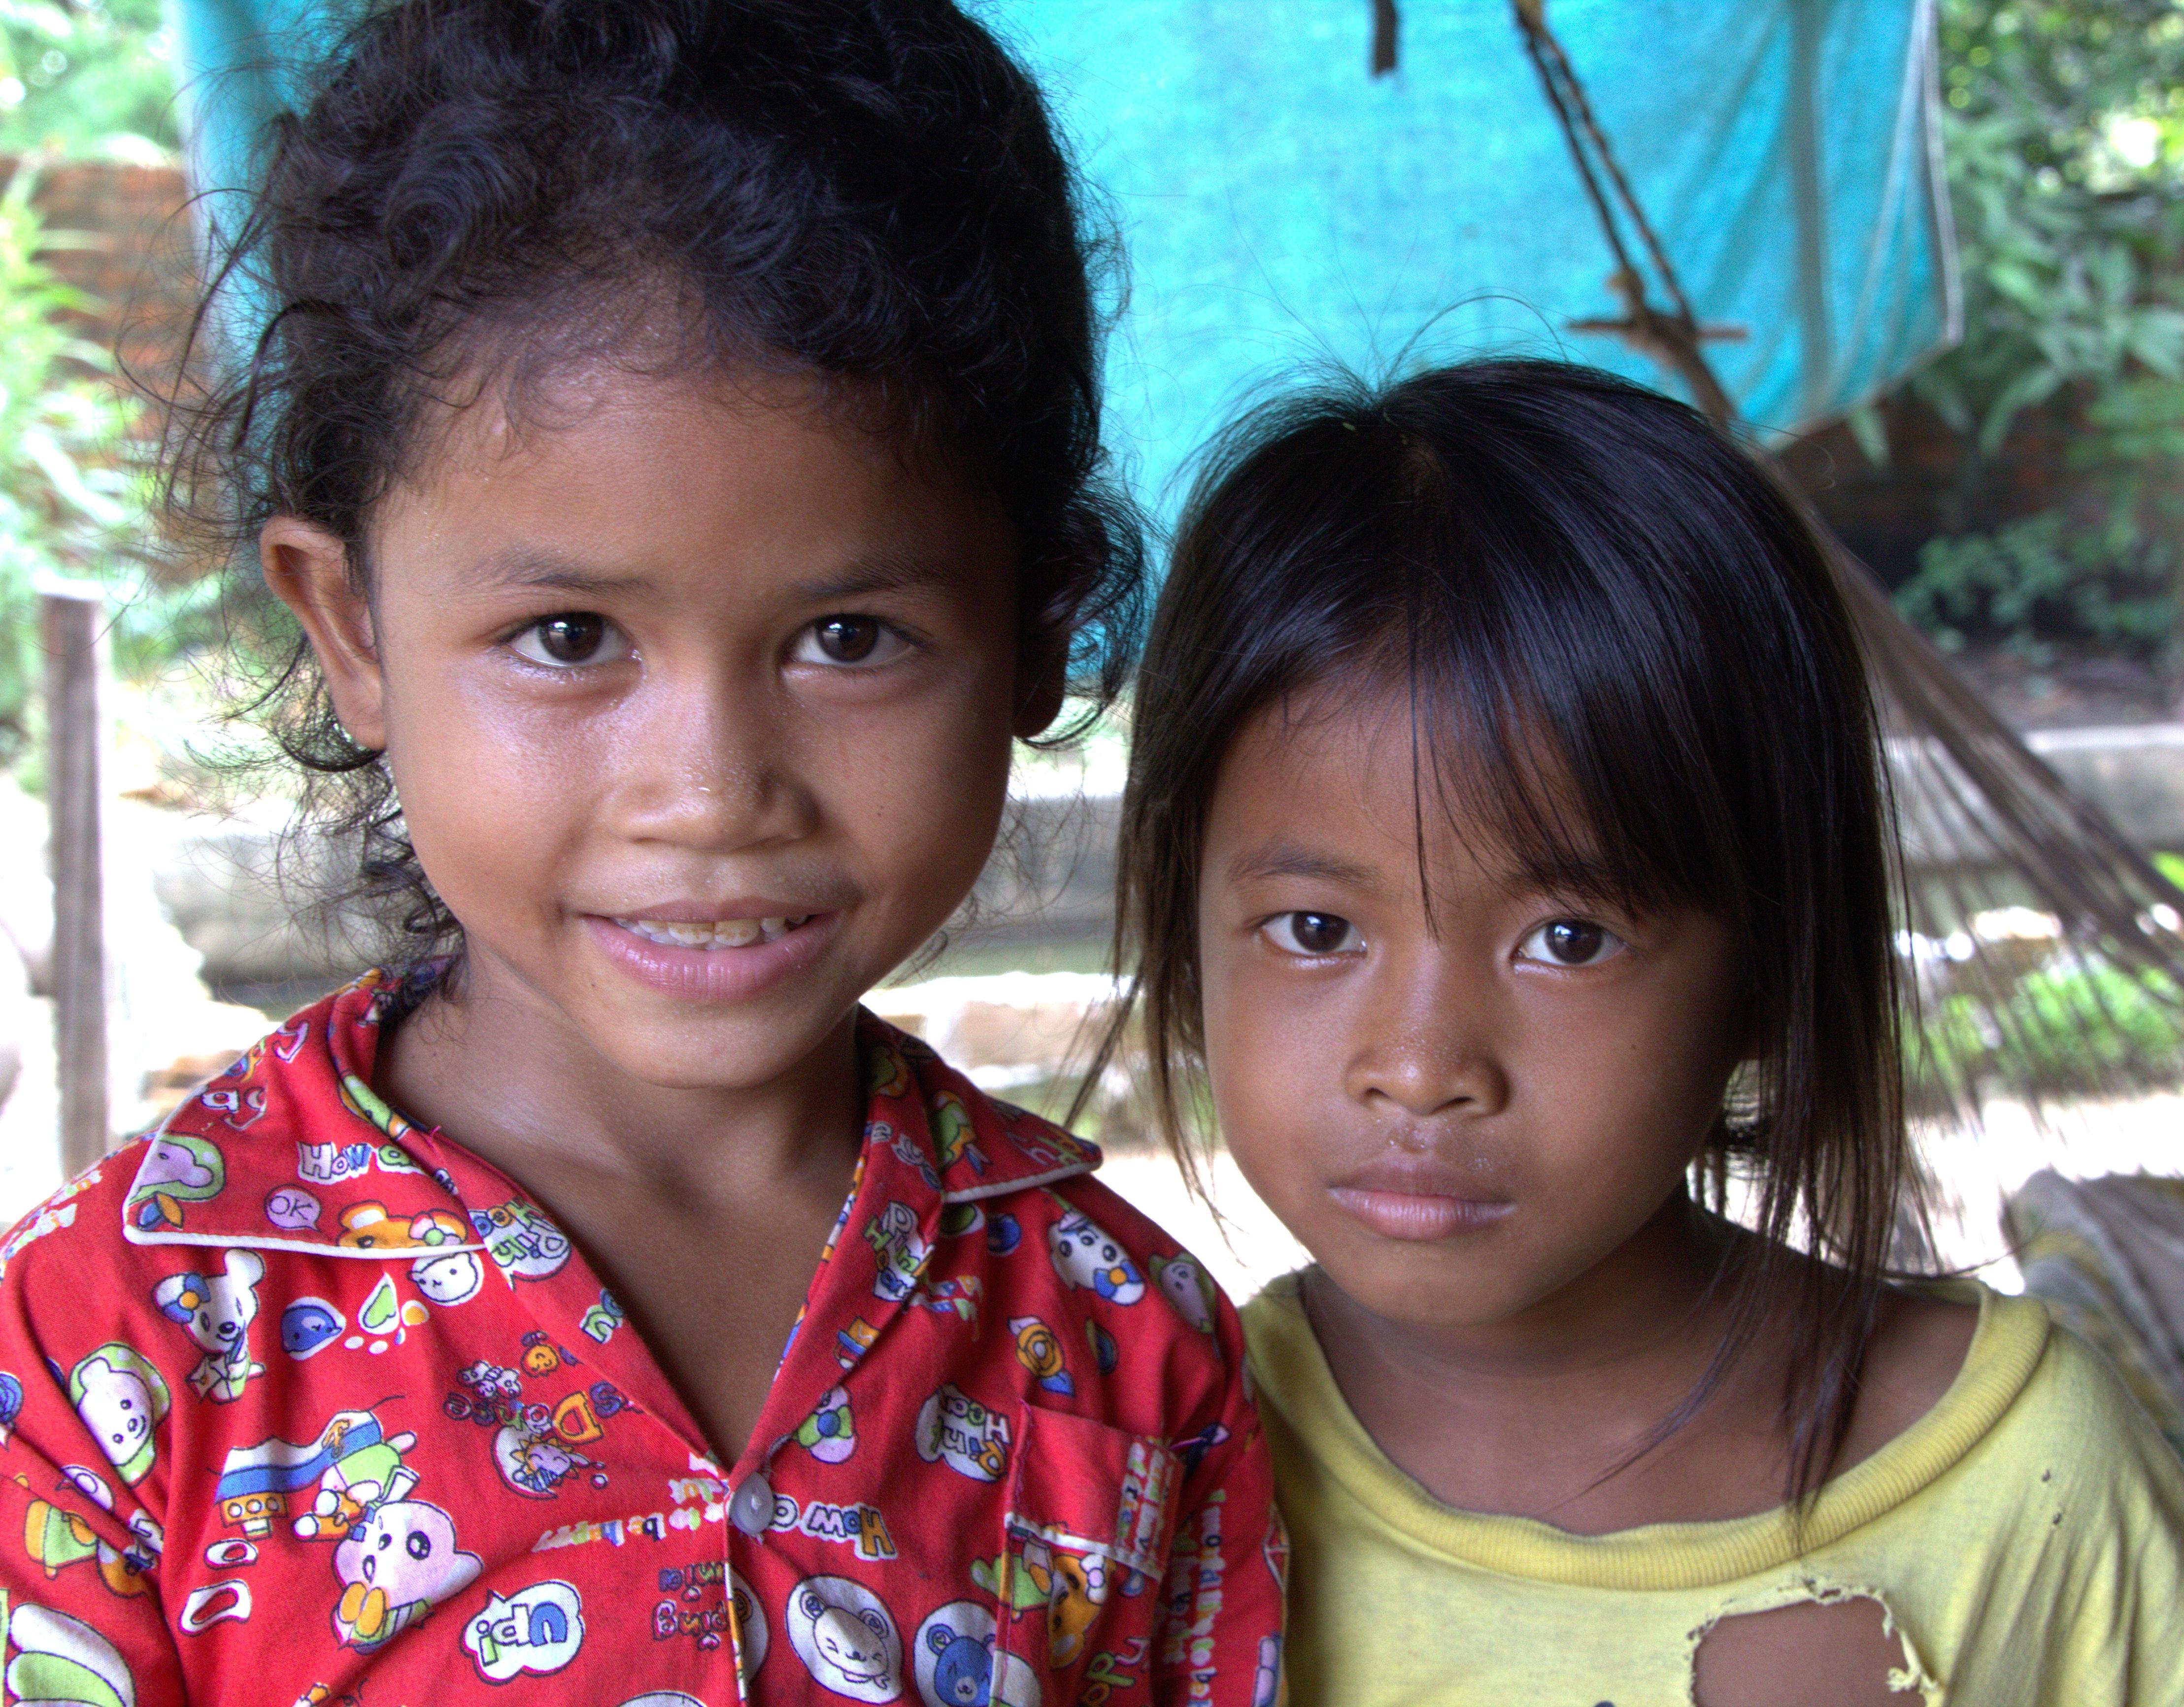 cambodia nud girl pics